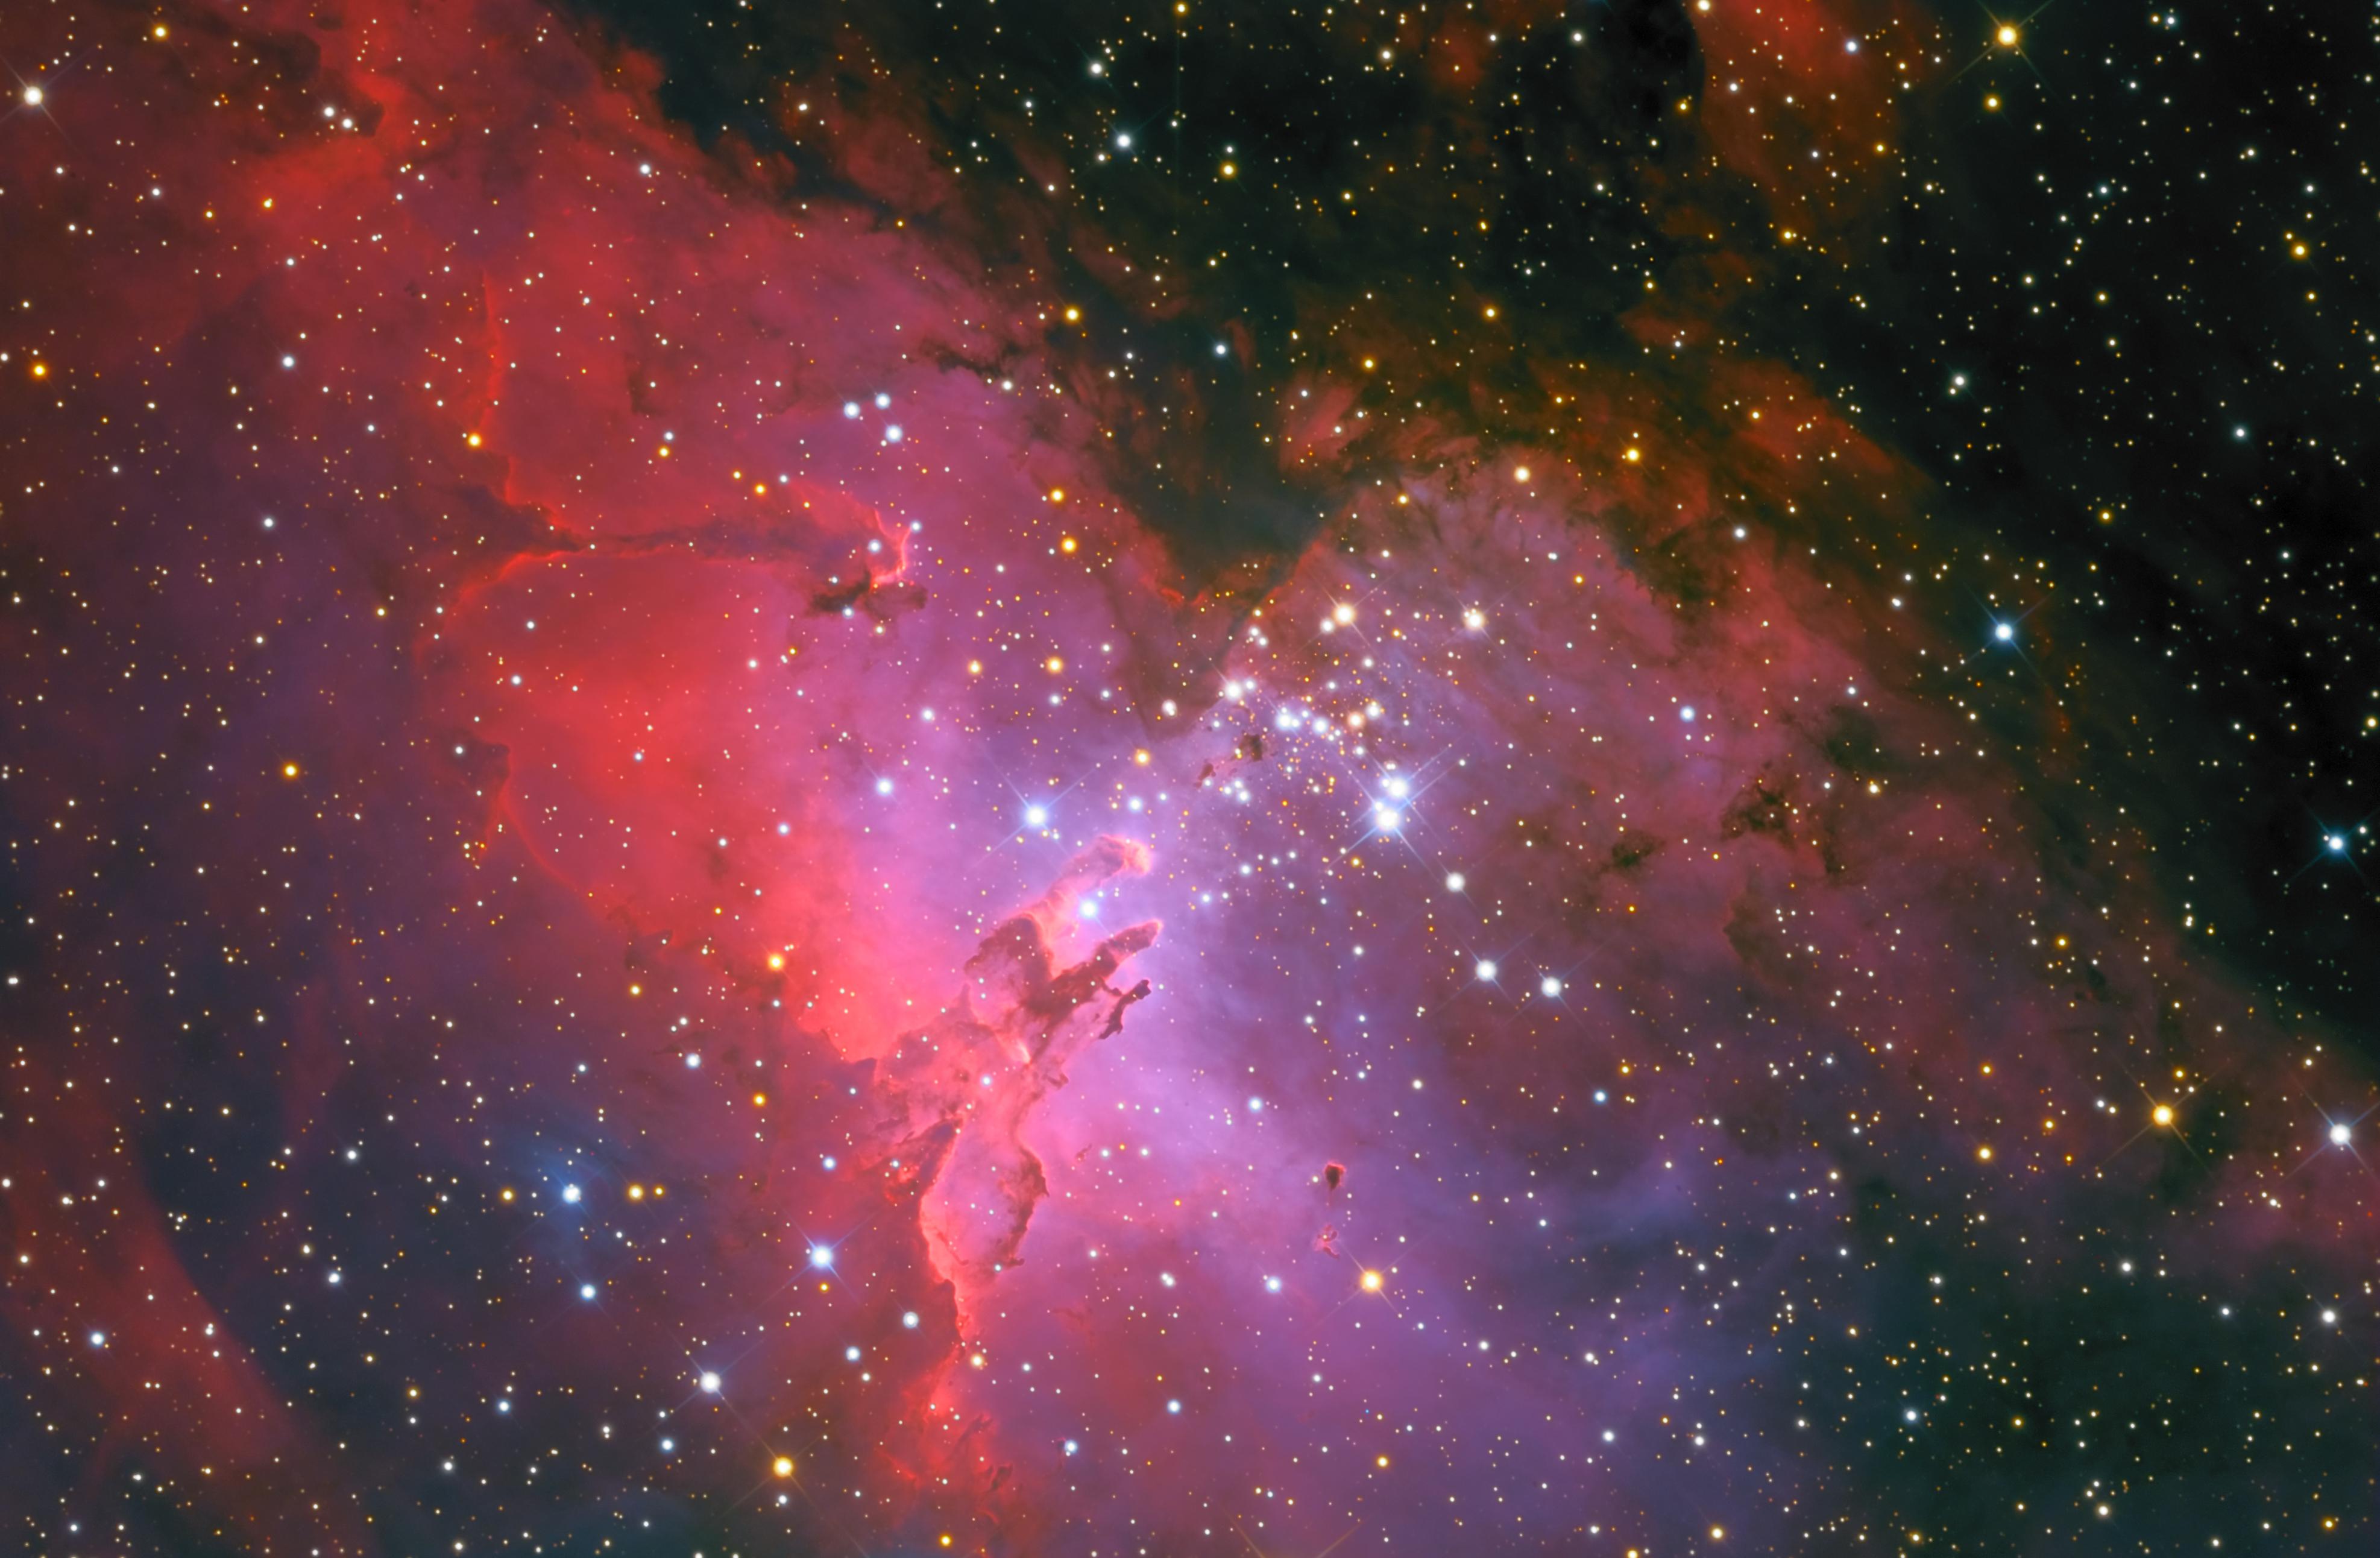 m16 eagle nebula face - photo #9